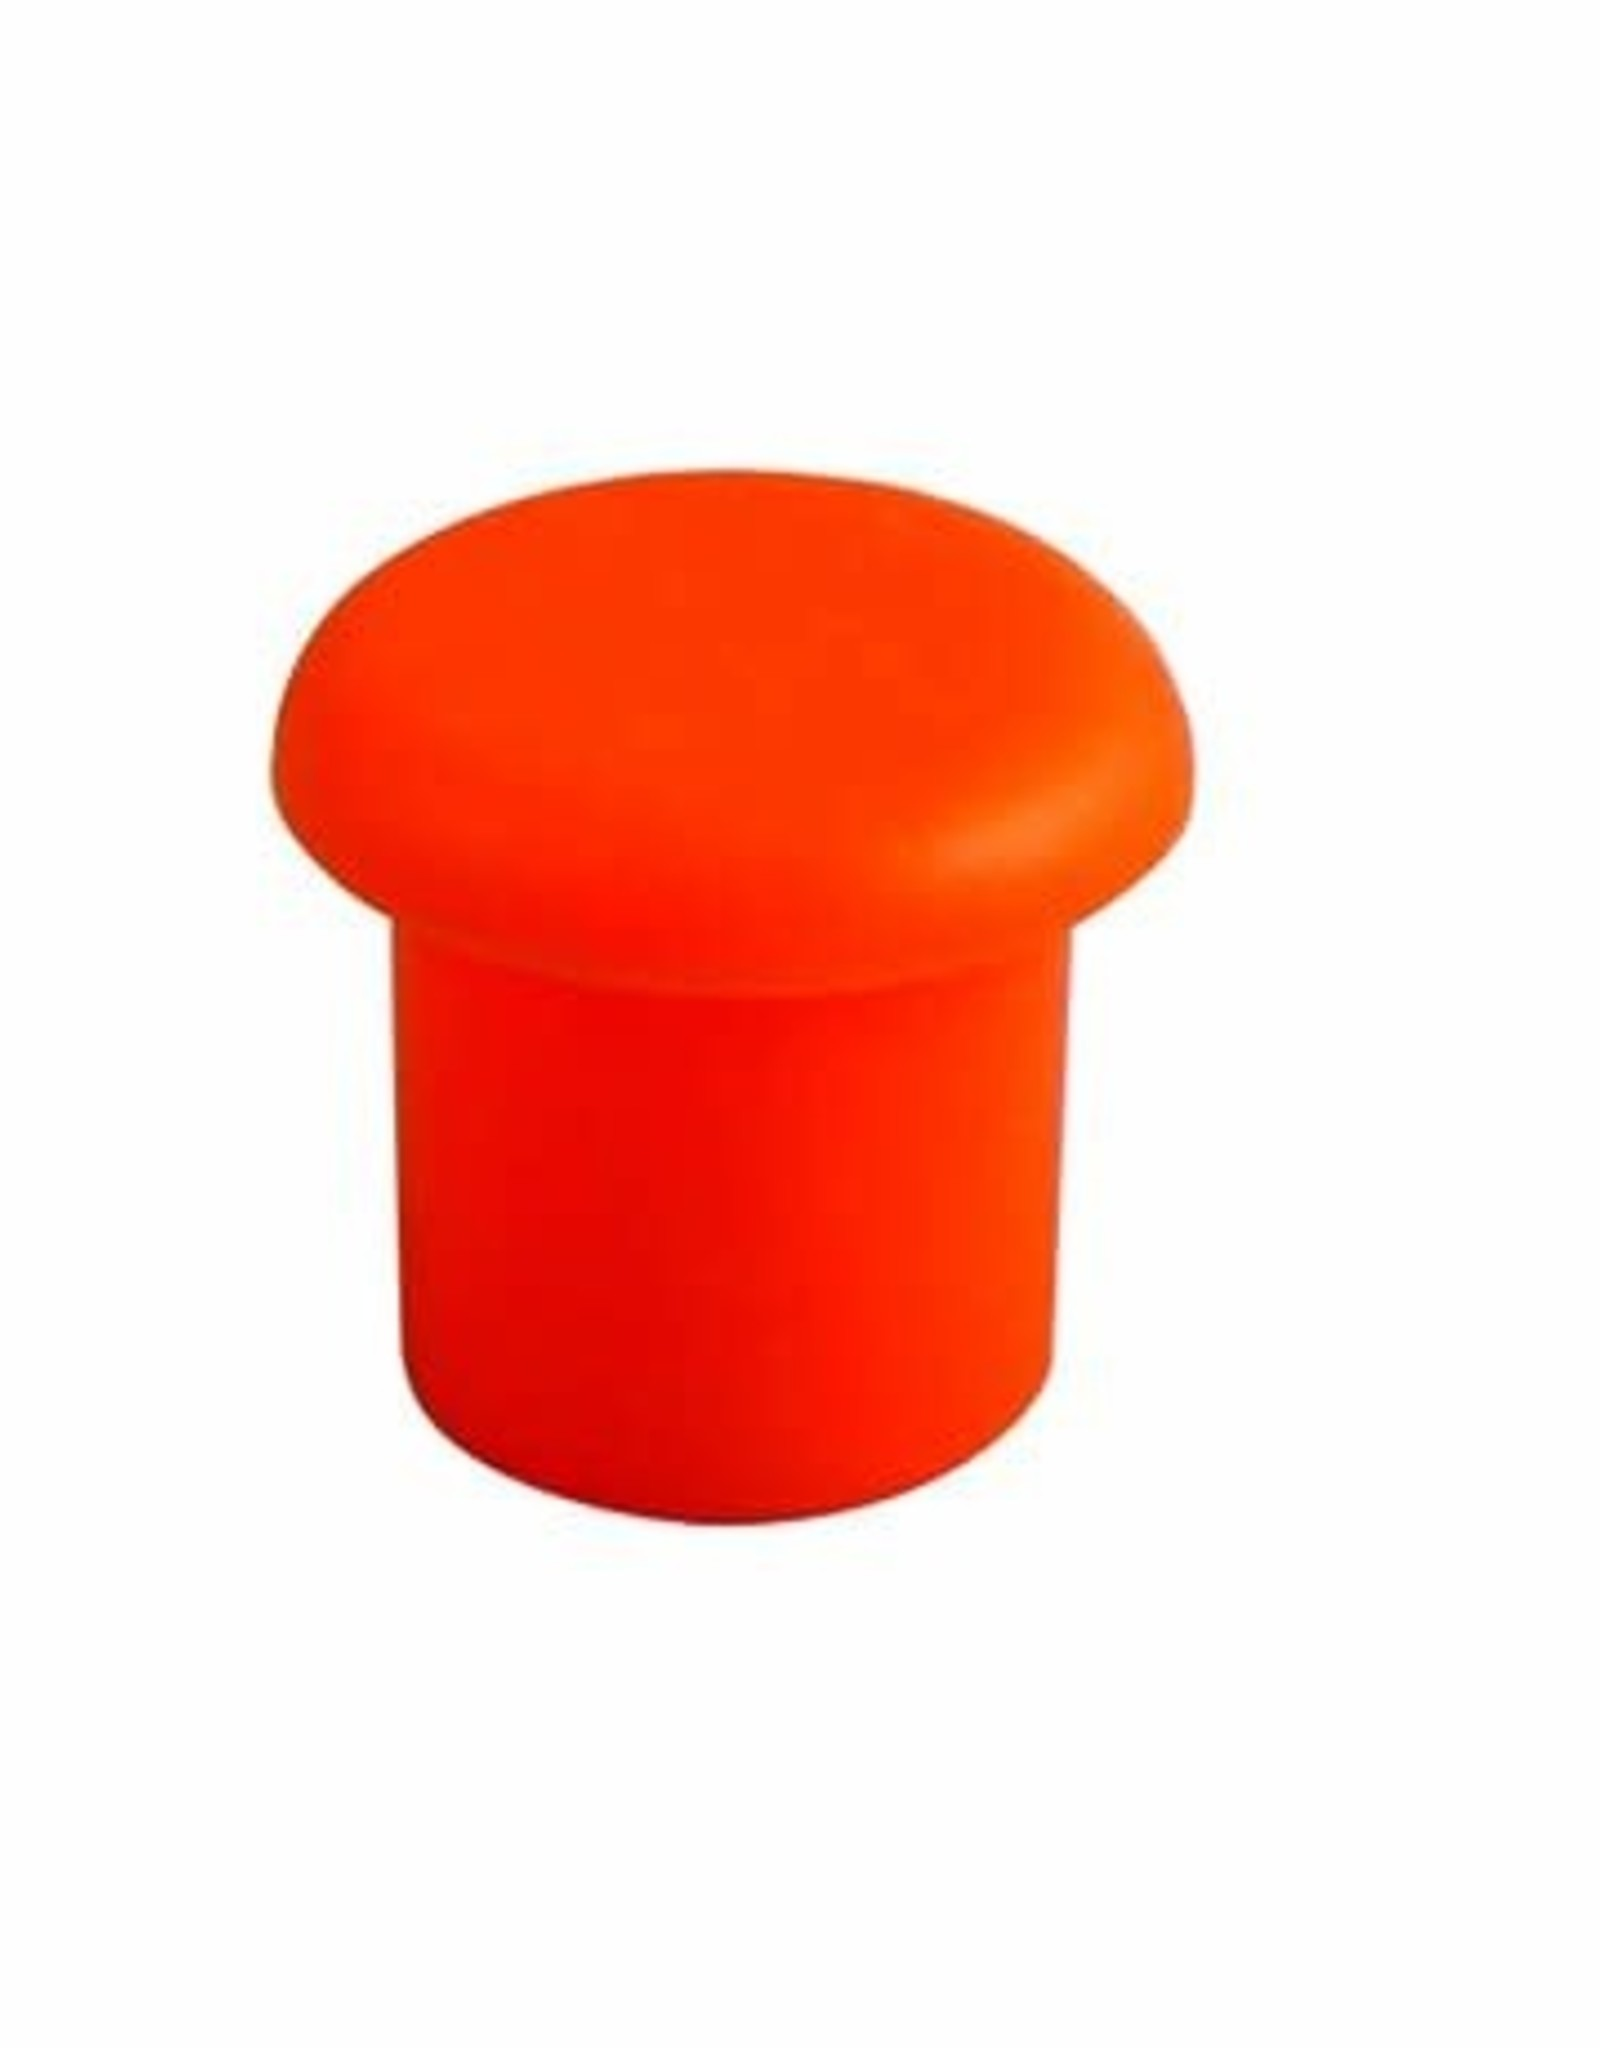 Econ-O-Guard Mushroom Top Safety Caps, Orange